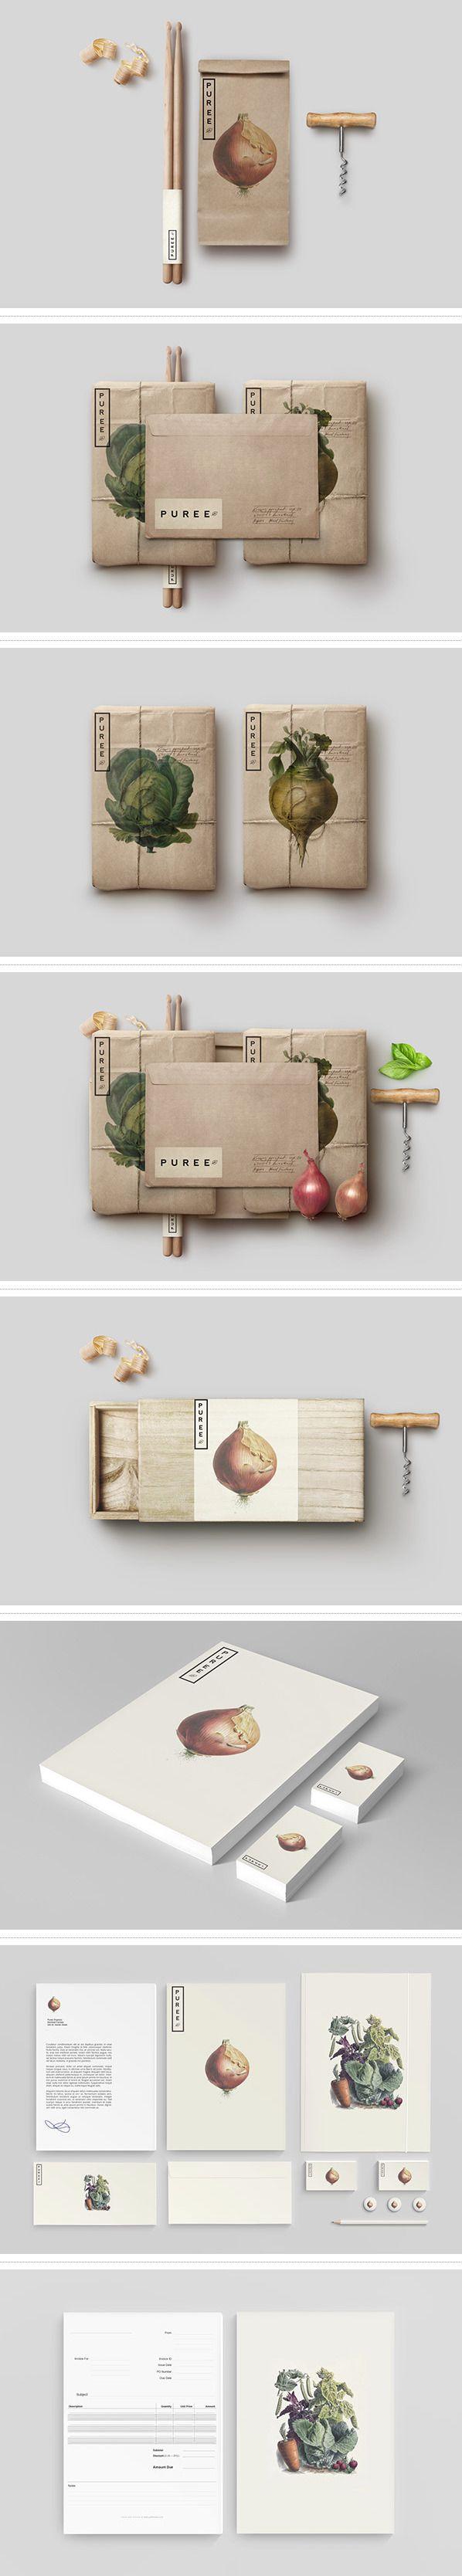 Puree Organics branding